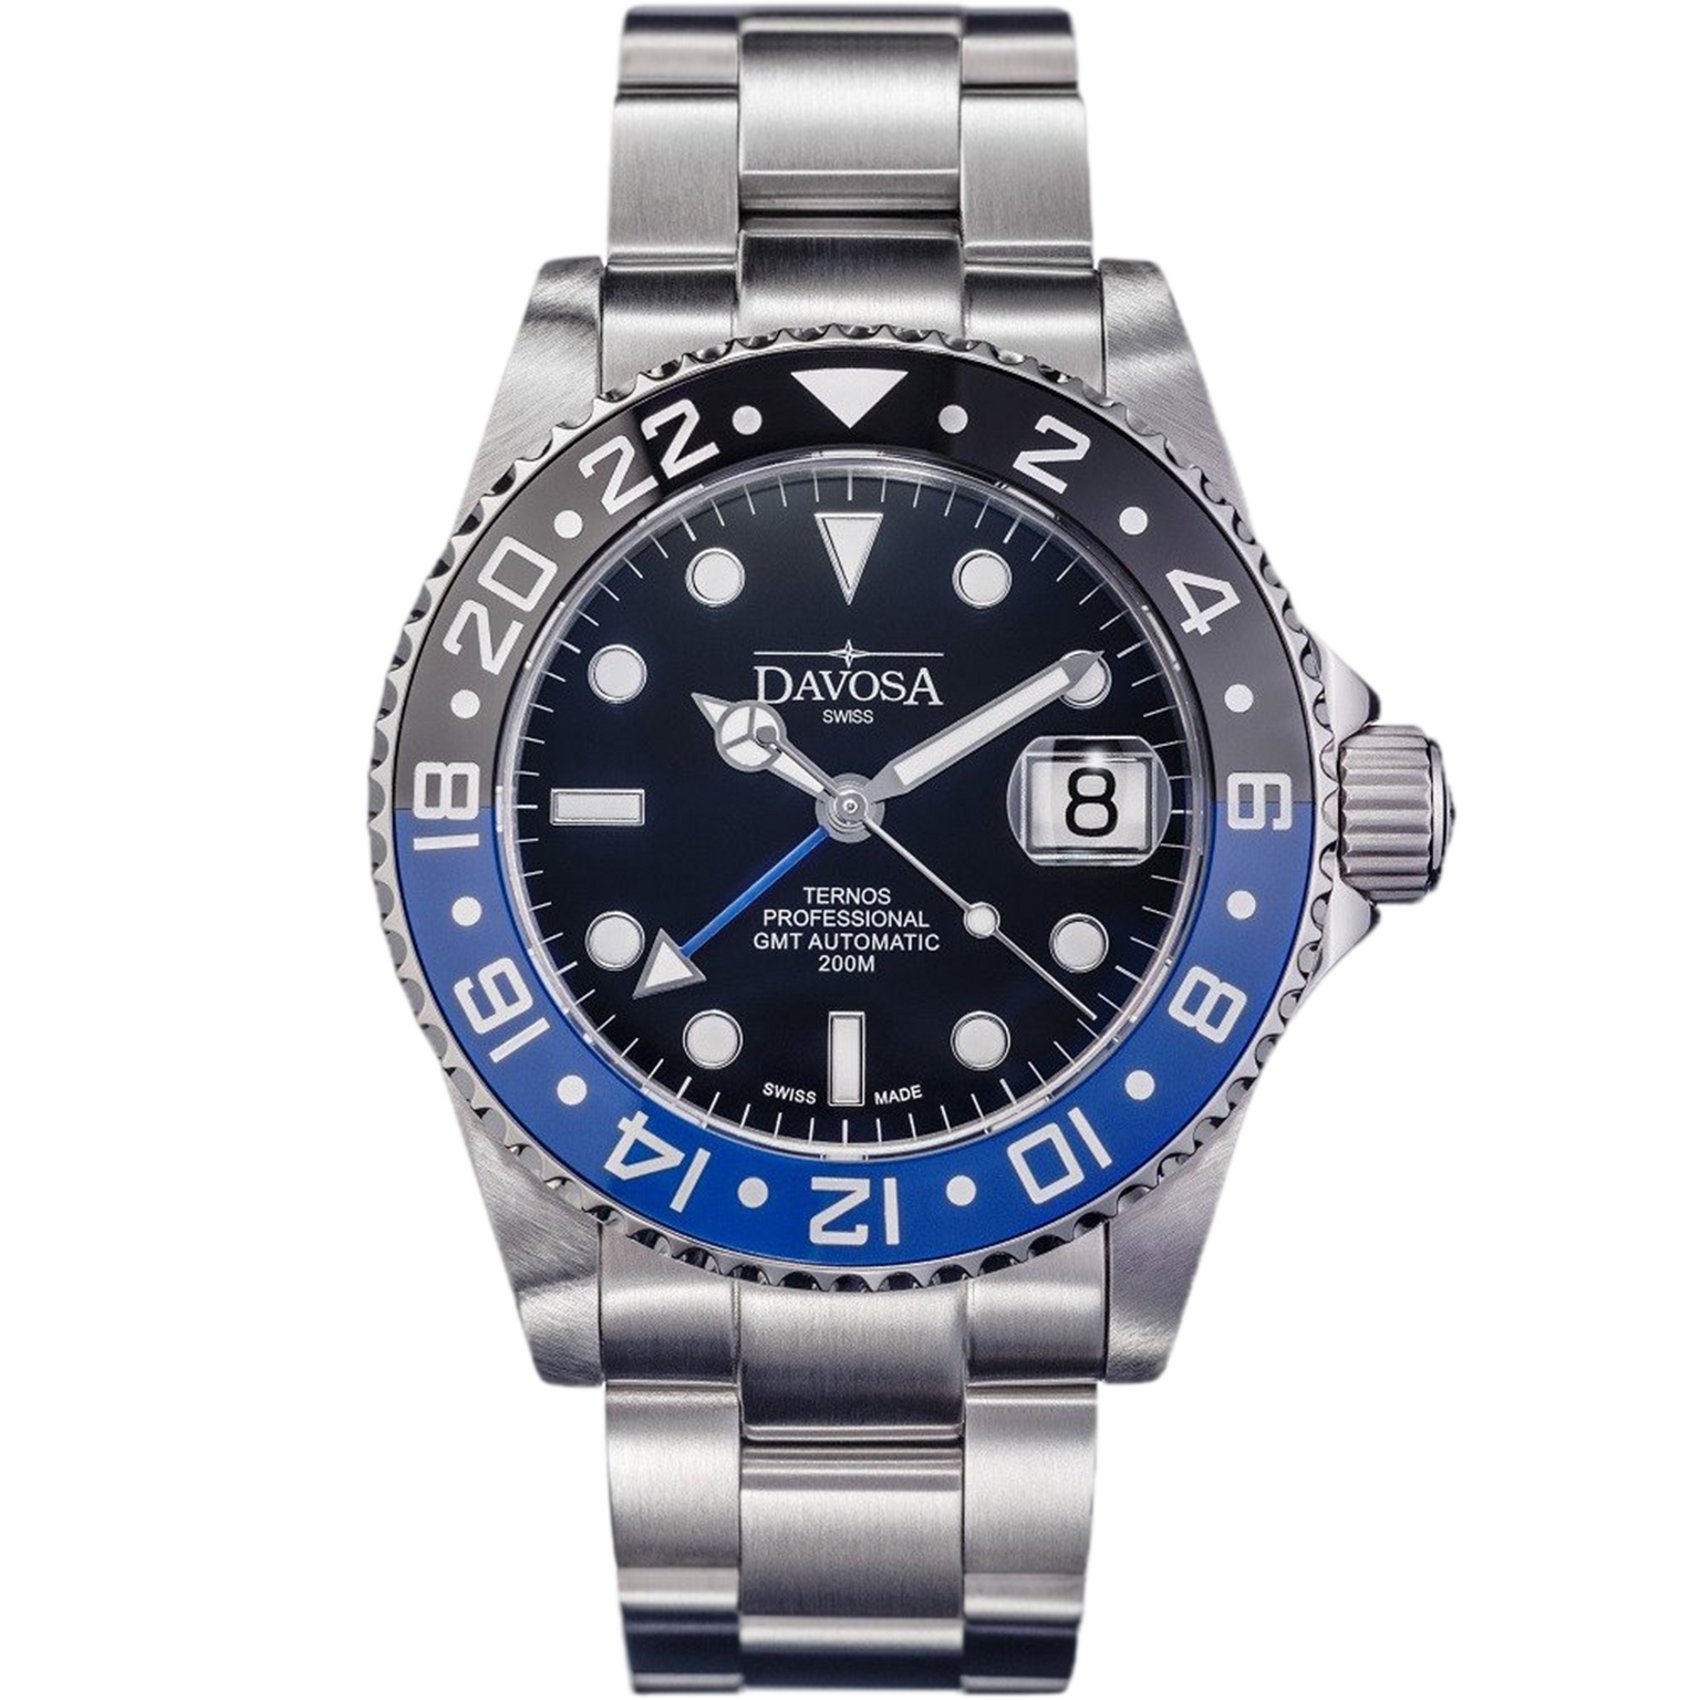 Davosa Swiss Made Professional Men Watch, Ternos 16157145 Automatic Illuminated Analog Display with Dual Time, Stylish Wrist Band & Ceramic Bezel